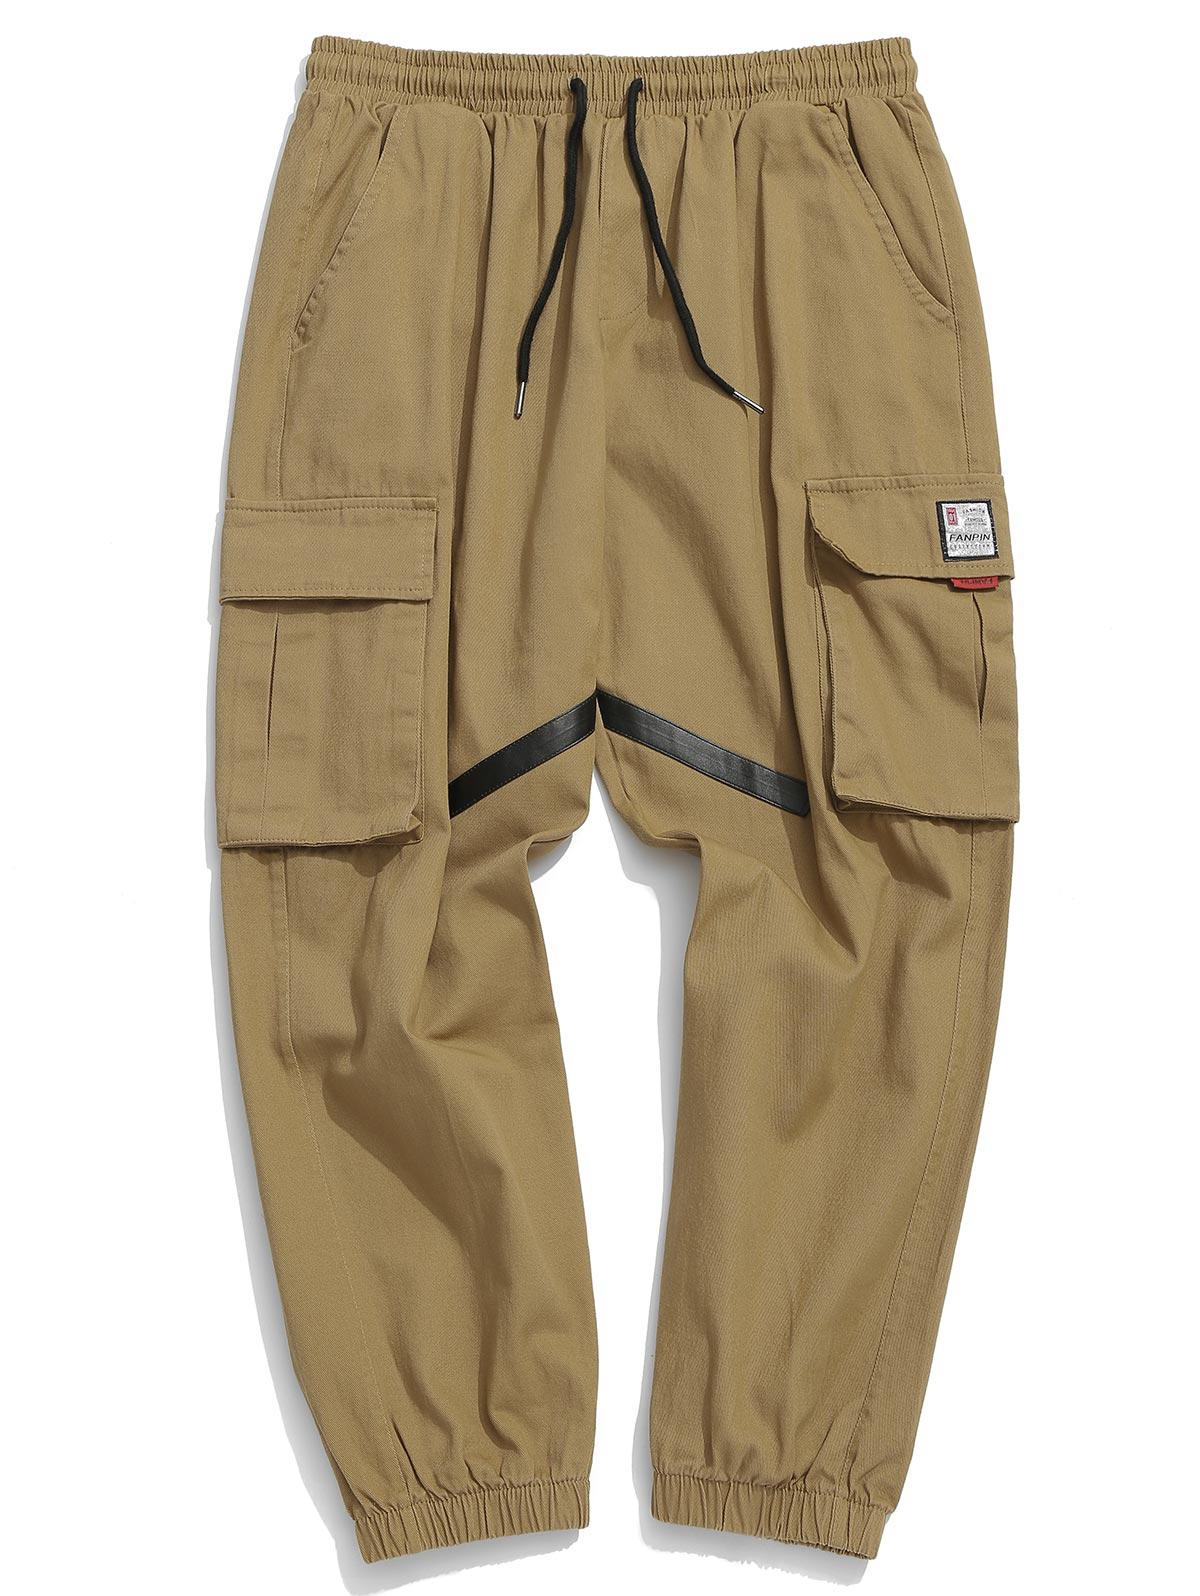 Applique Striped Pockets Drawstring Jogger Pants